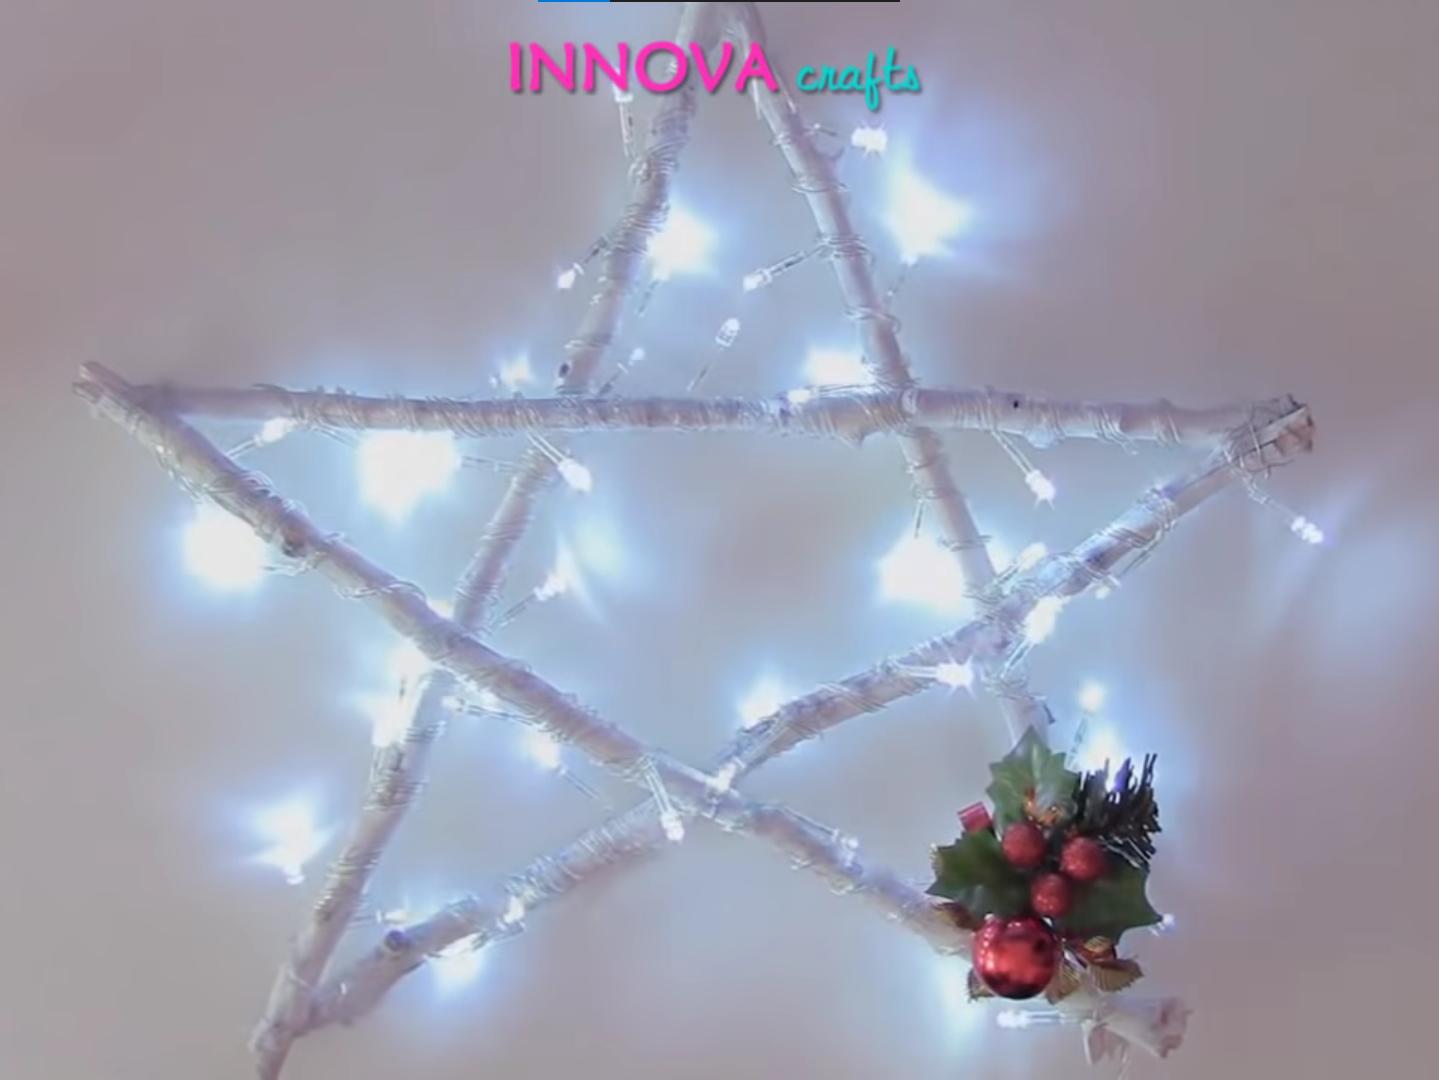 hiasan natal bintang